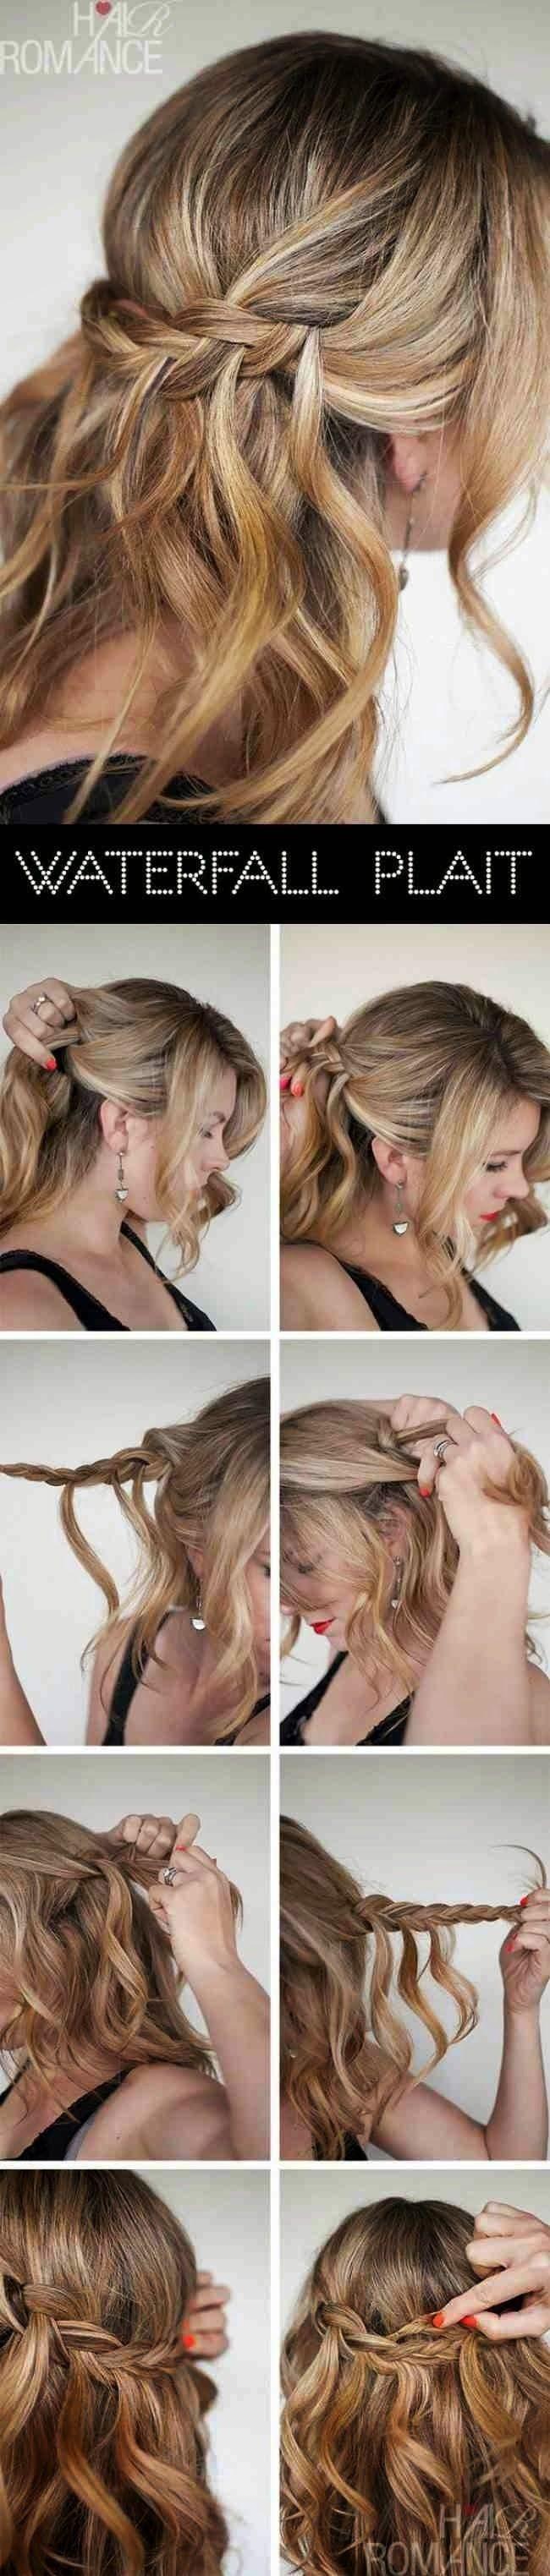 Half-Up Half-Down Hair Tutorials 2014 img745ed9dd0ed06fbcd